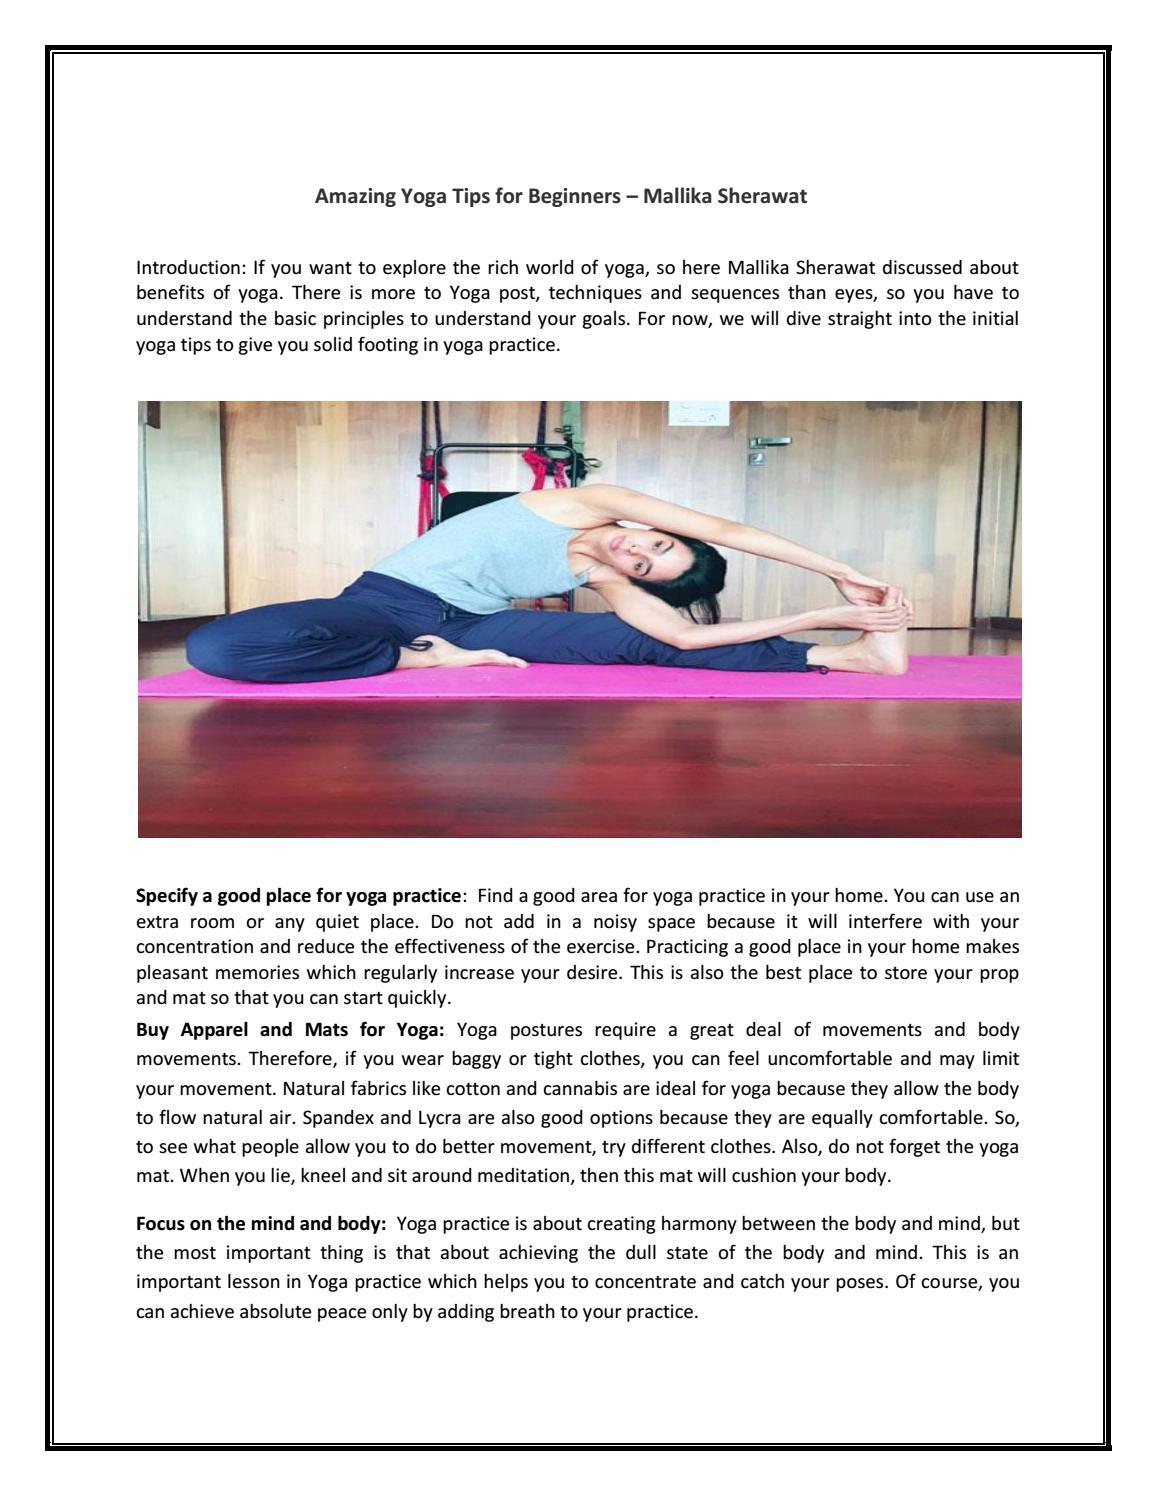 Amazing Yoga Tips For Beginners Mallika Sherawat By Latestbollywoodtrendsb Issuu